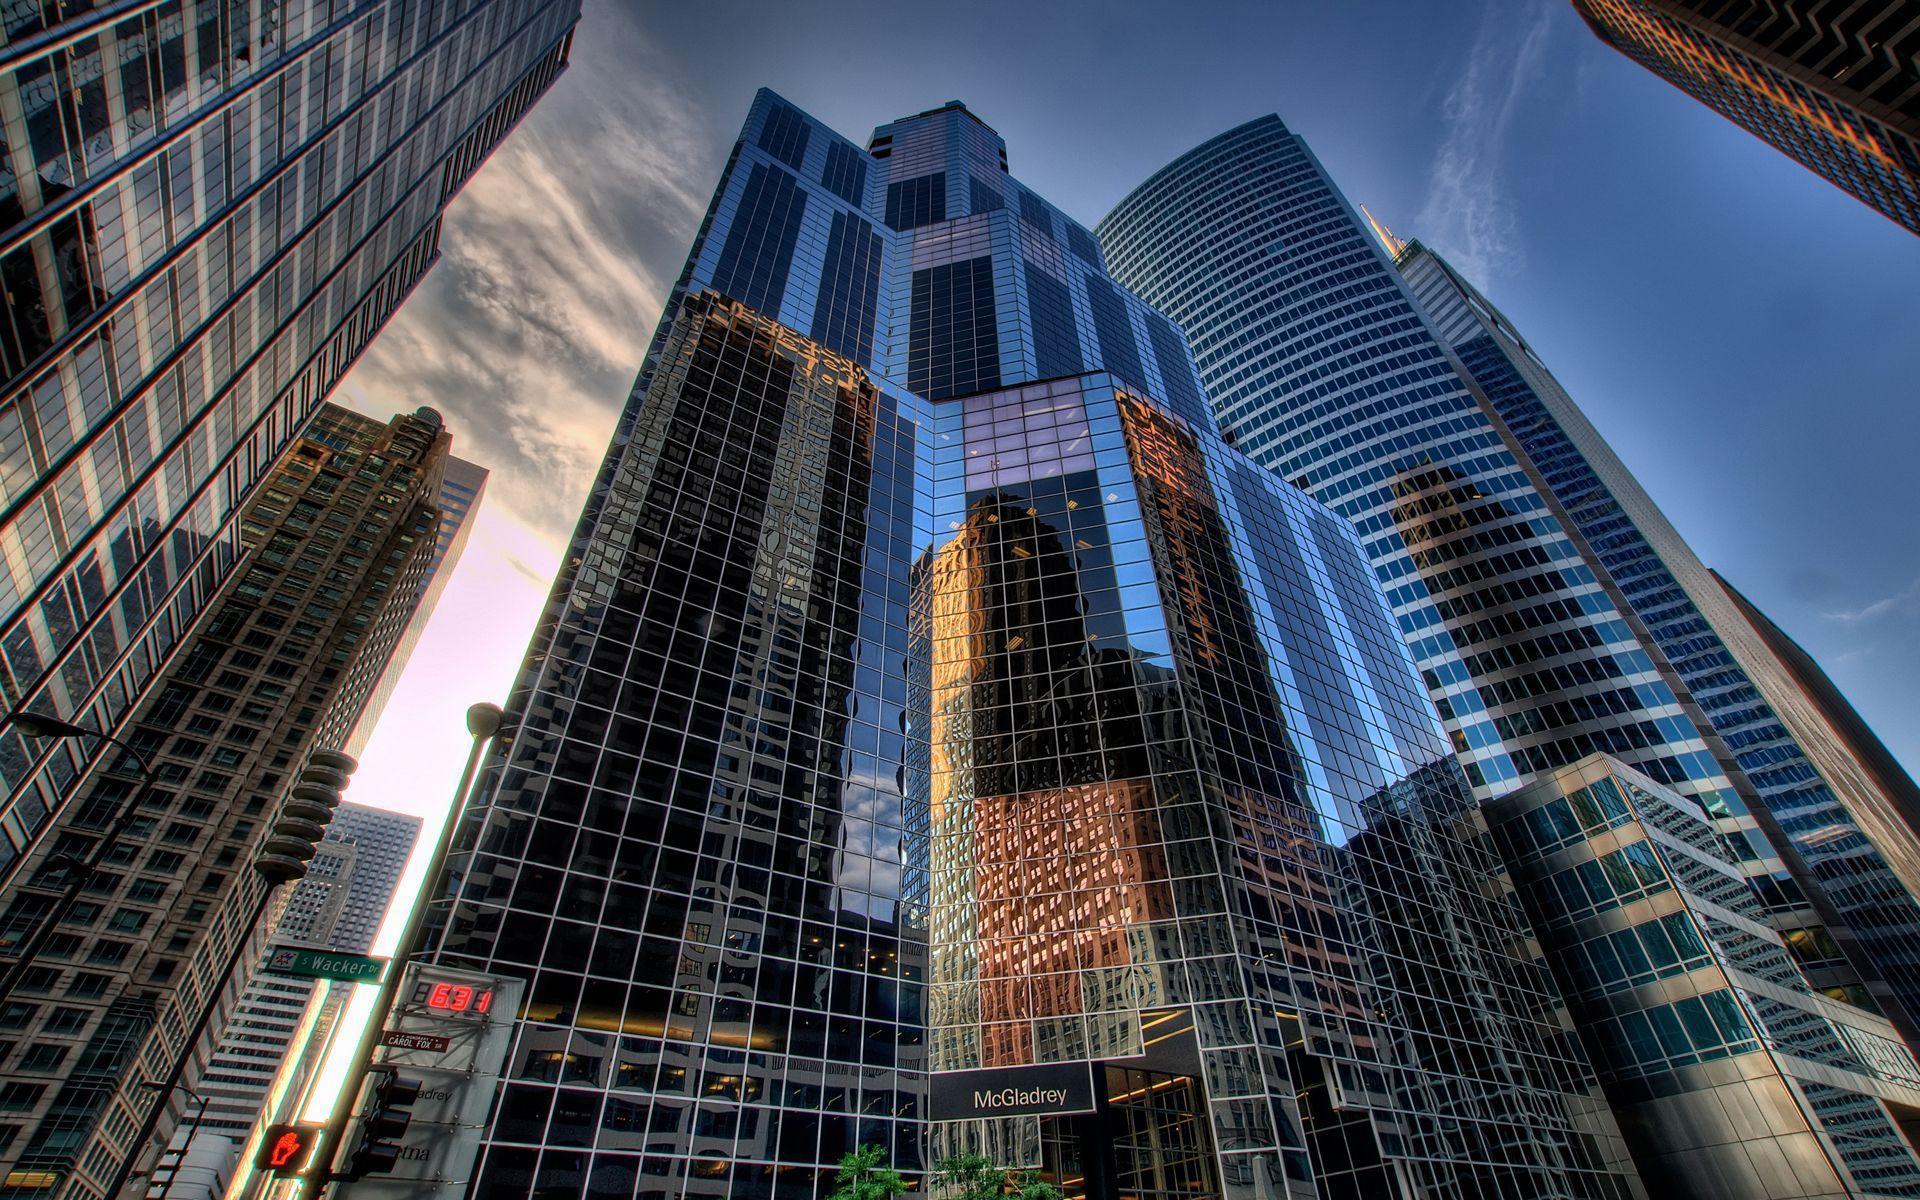 Amazing Buildings Wallpapers - Top Free Amazing Buildings ...